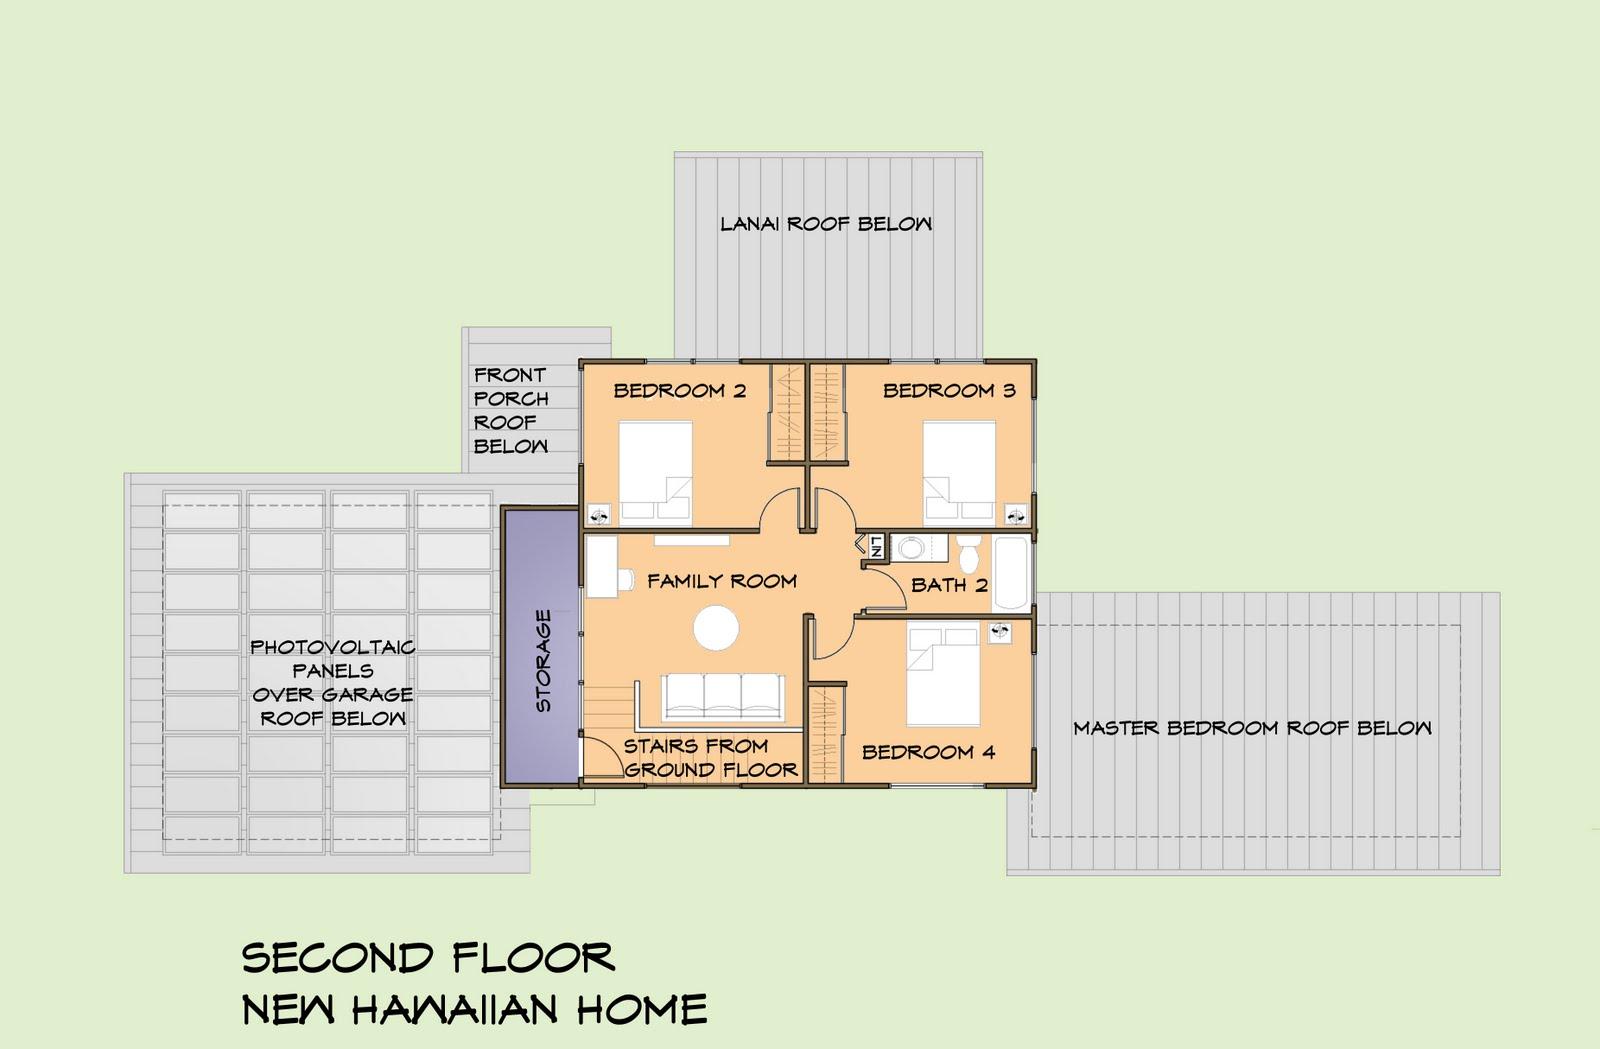 Hawaii Home Floor Plans on hawaii bedrooms, hawaii home design, hawaii home exteriors, hawaii plantation home plans, hawaii home kitchen, hawaii luxury house plans, hawaii house designs, hawaii luxury homes, hawaii home interiors, architectural designs house plans,